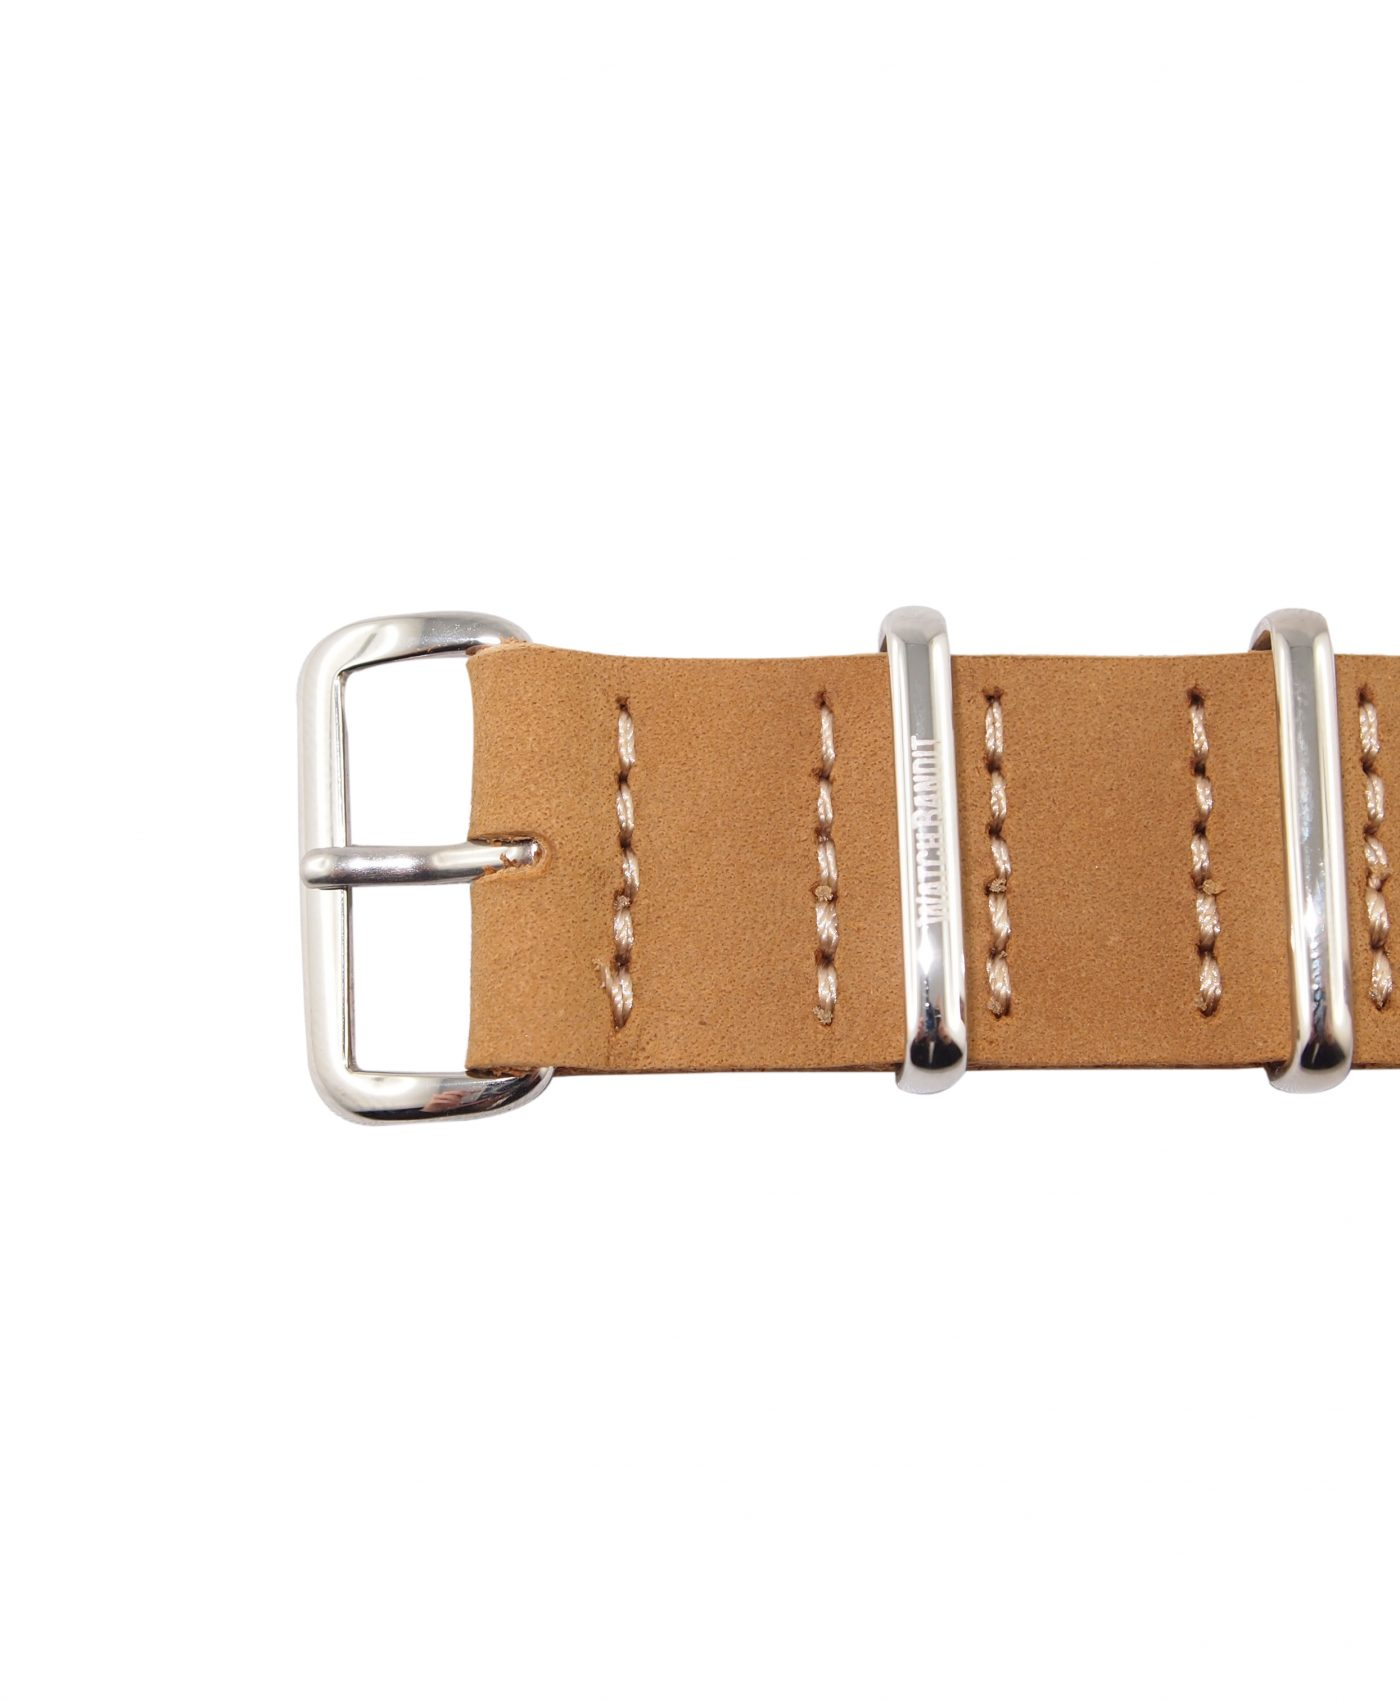 Nato Strap | Natural Leather | Polished